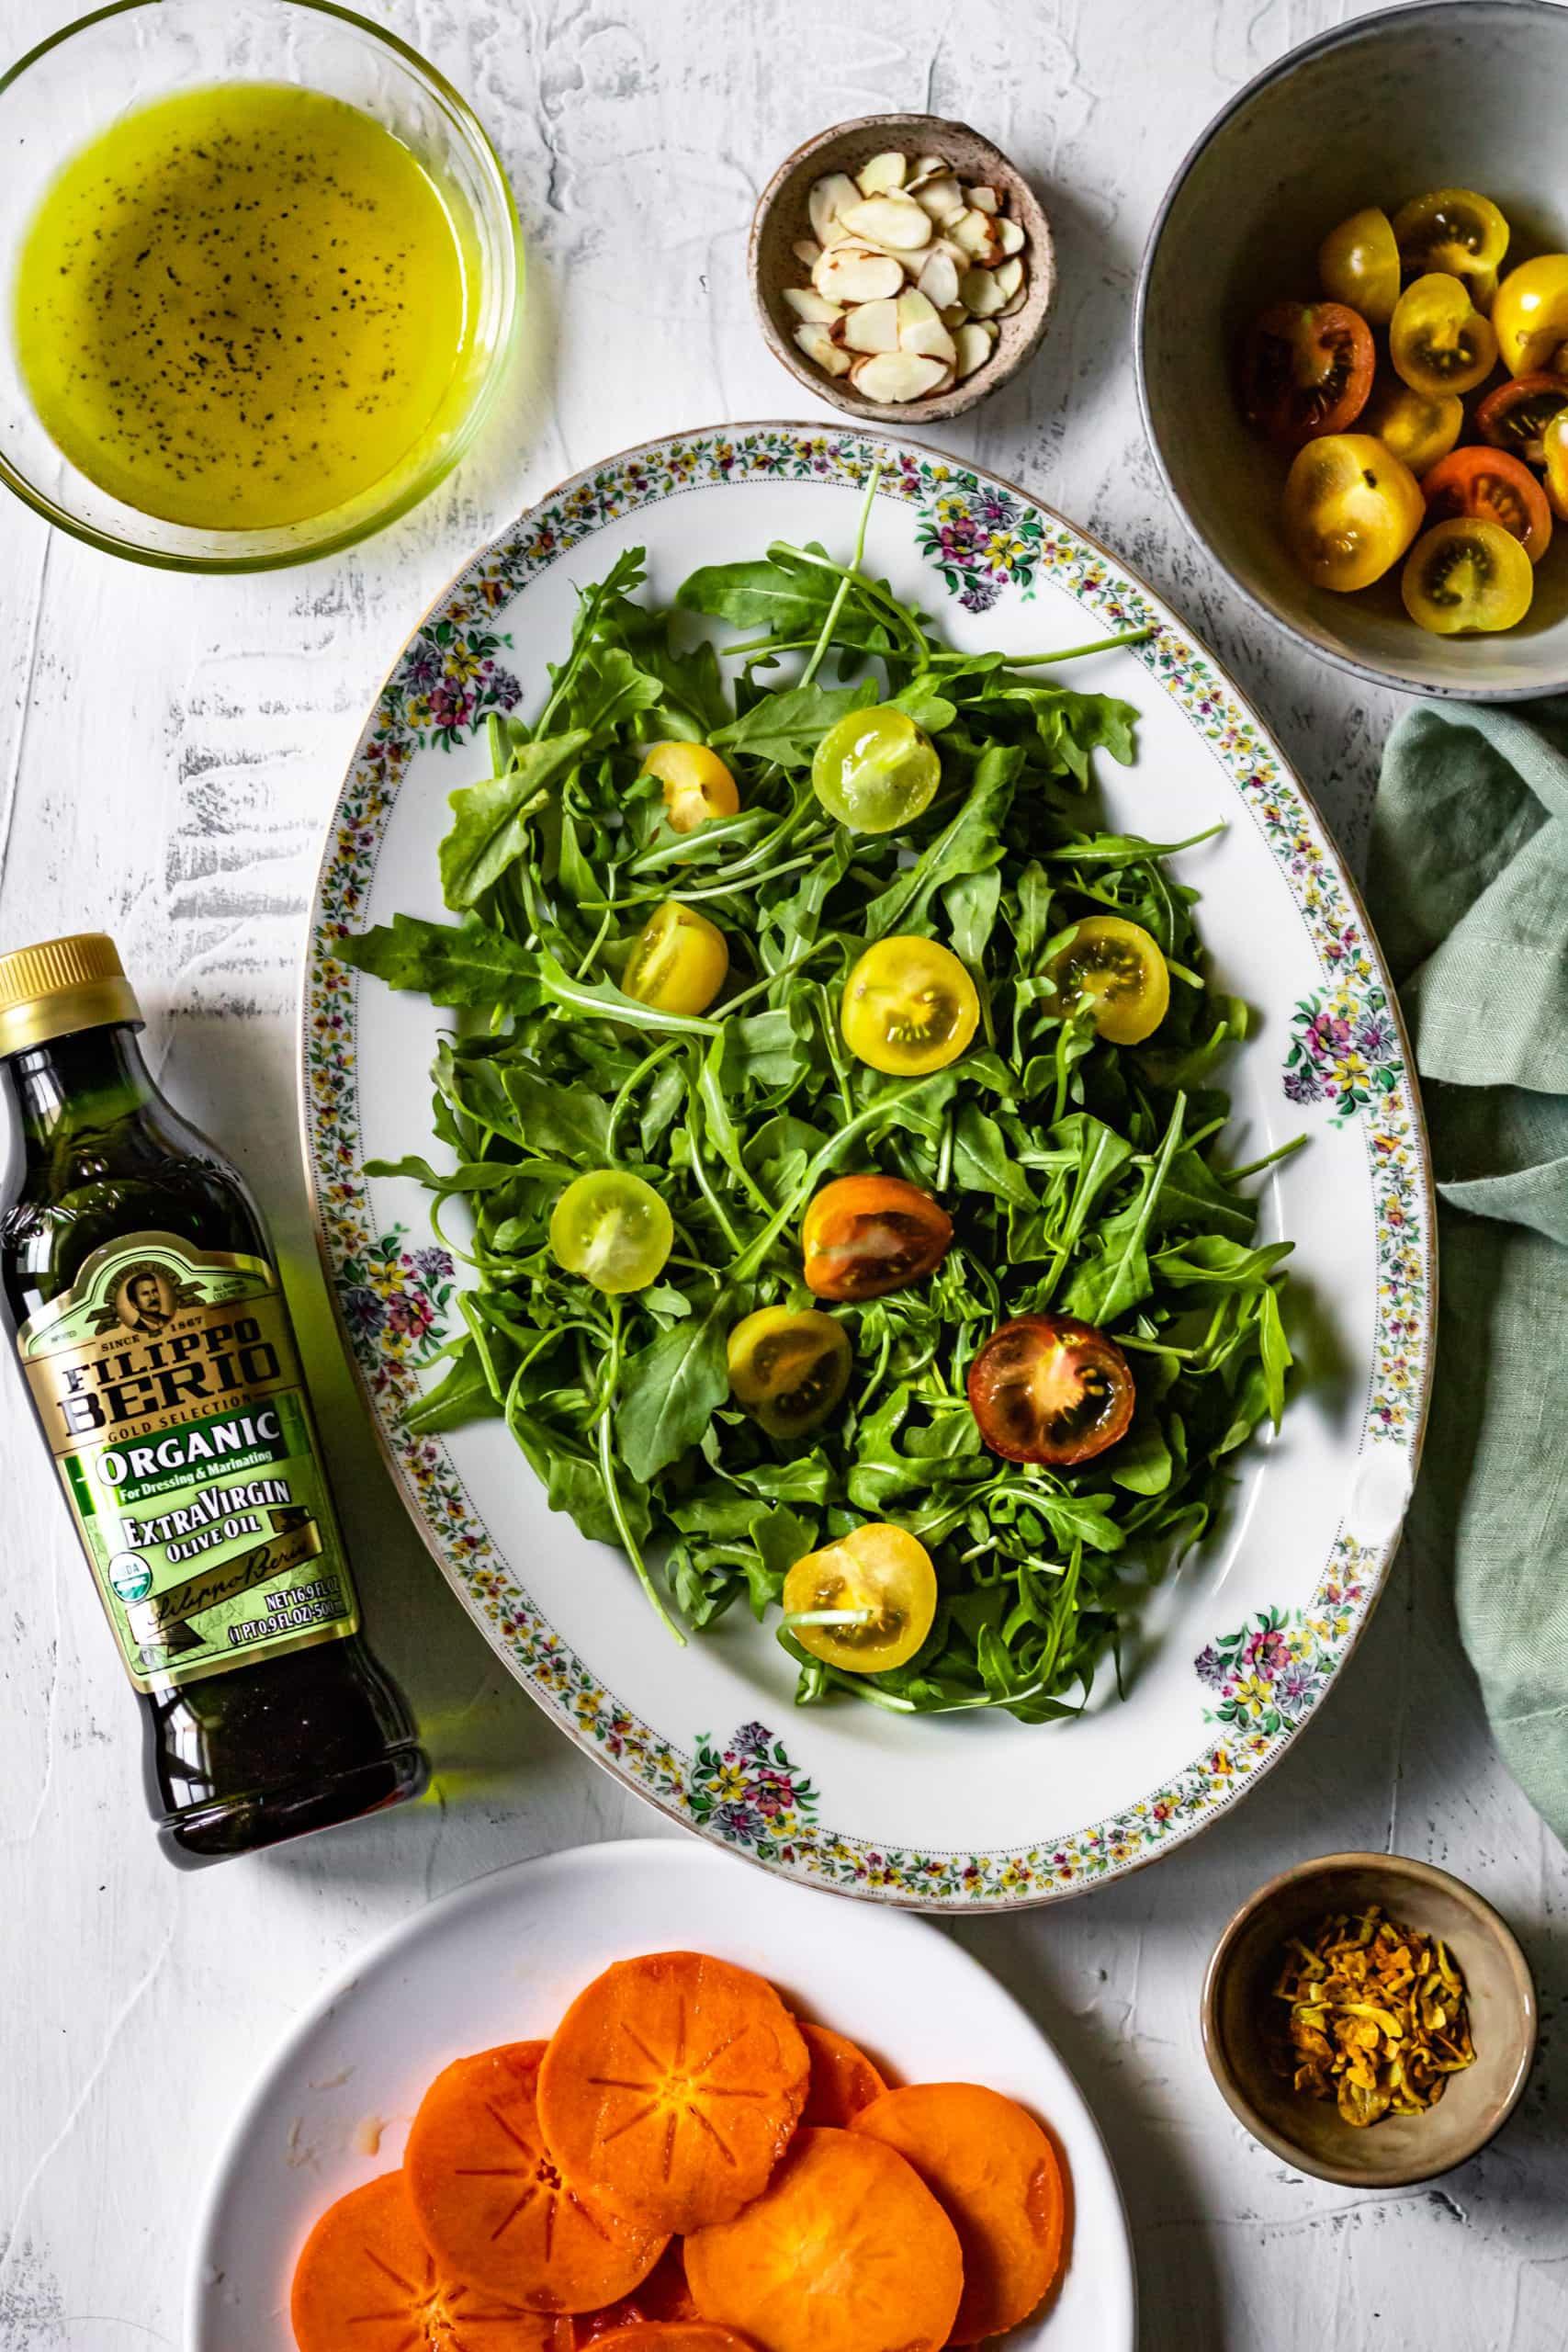 ingredients for winter persimmon salad